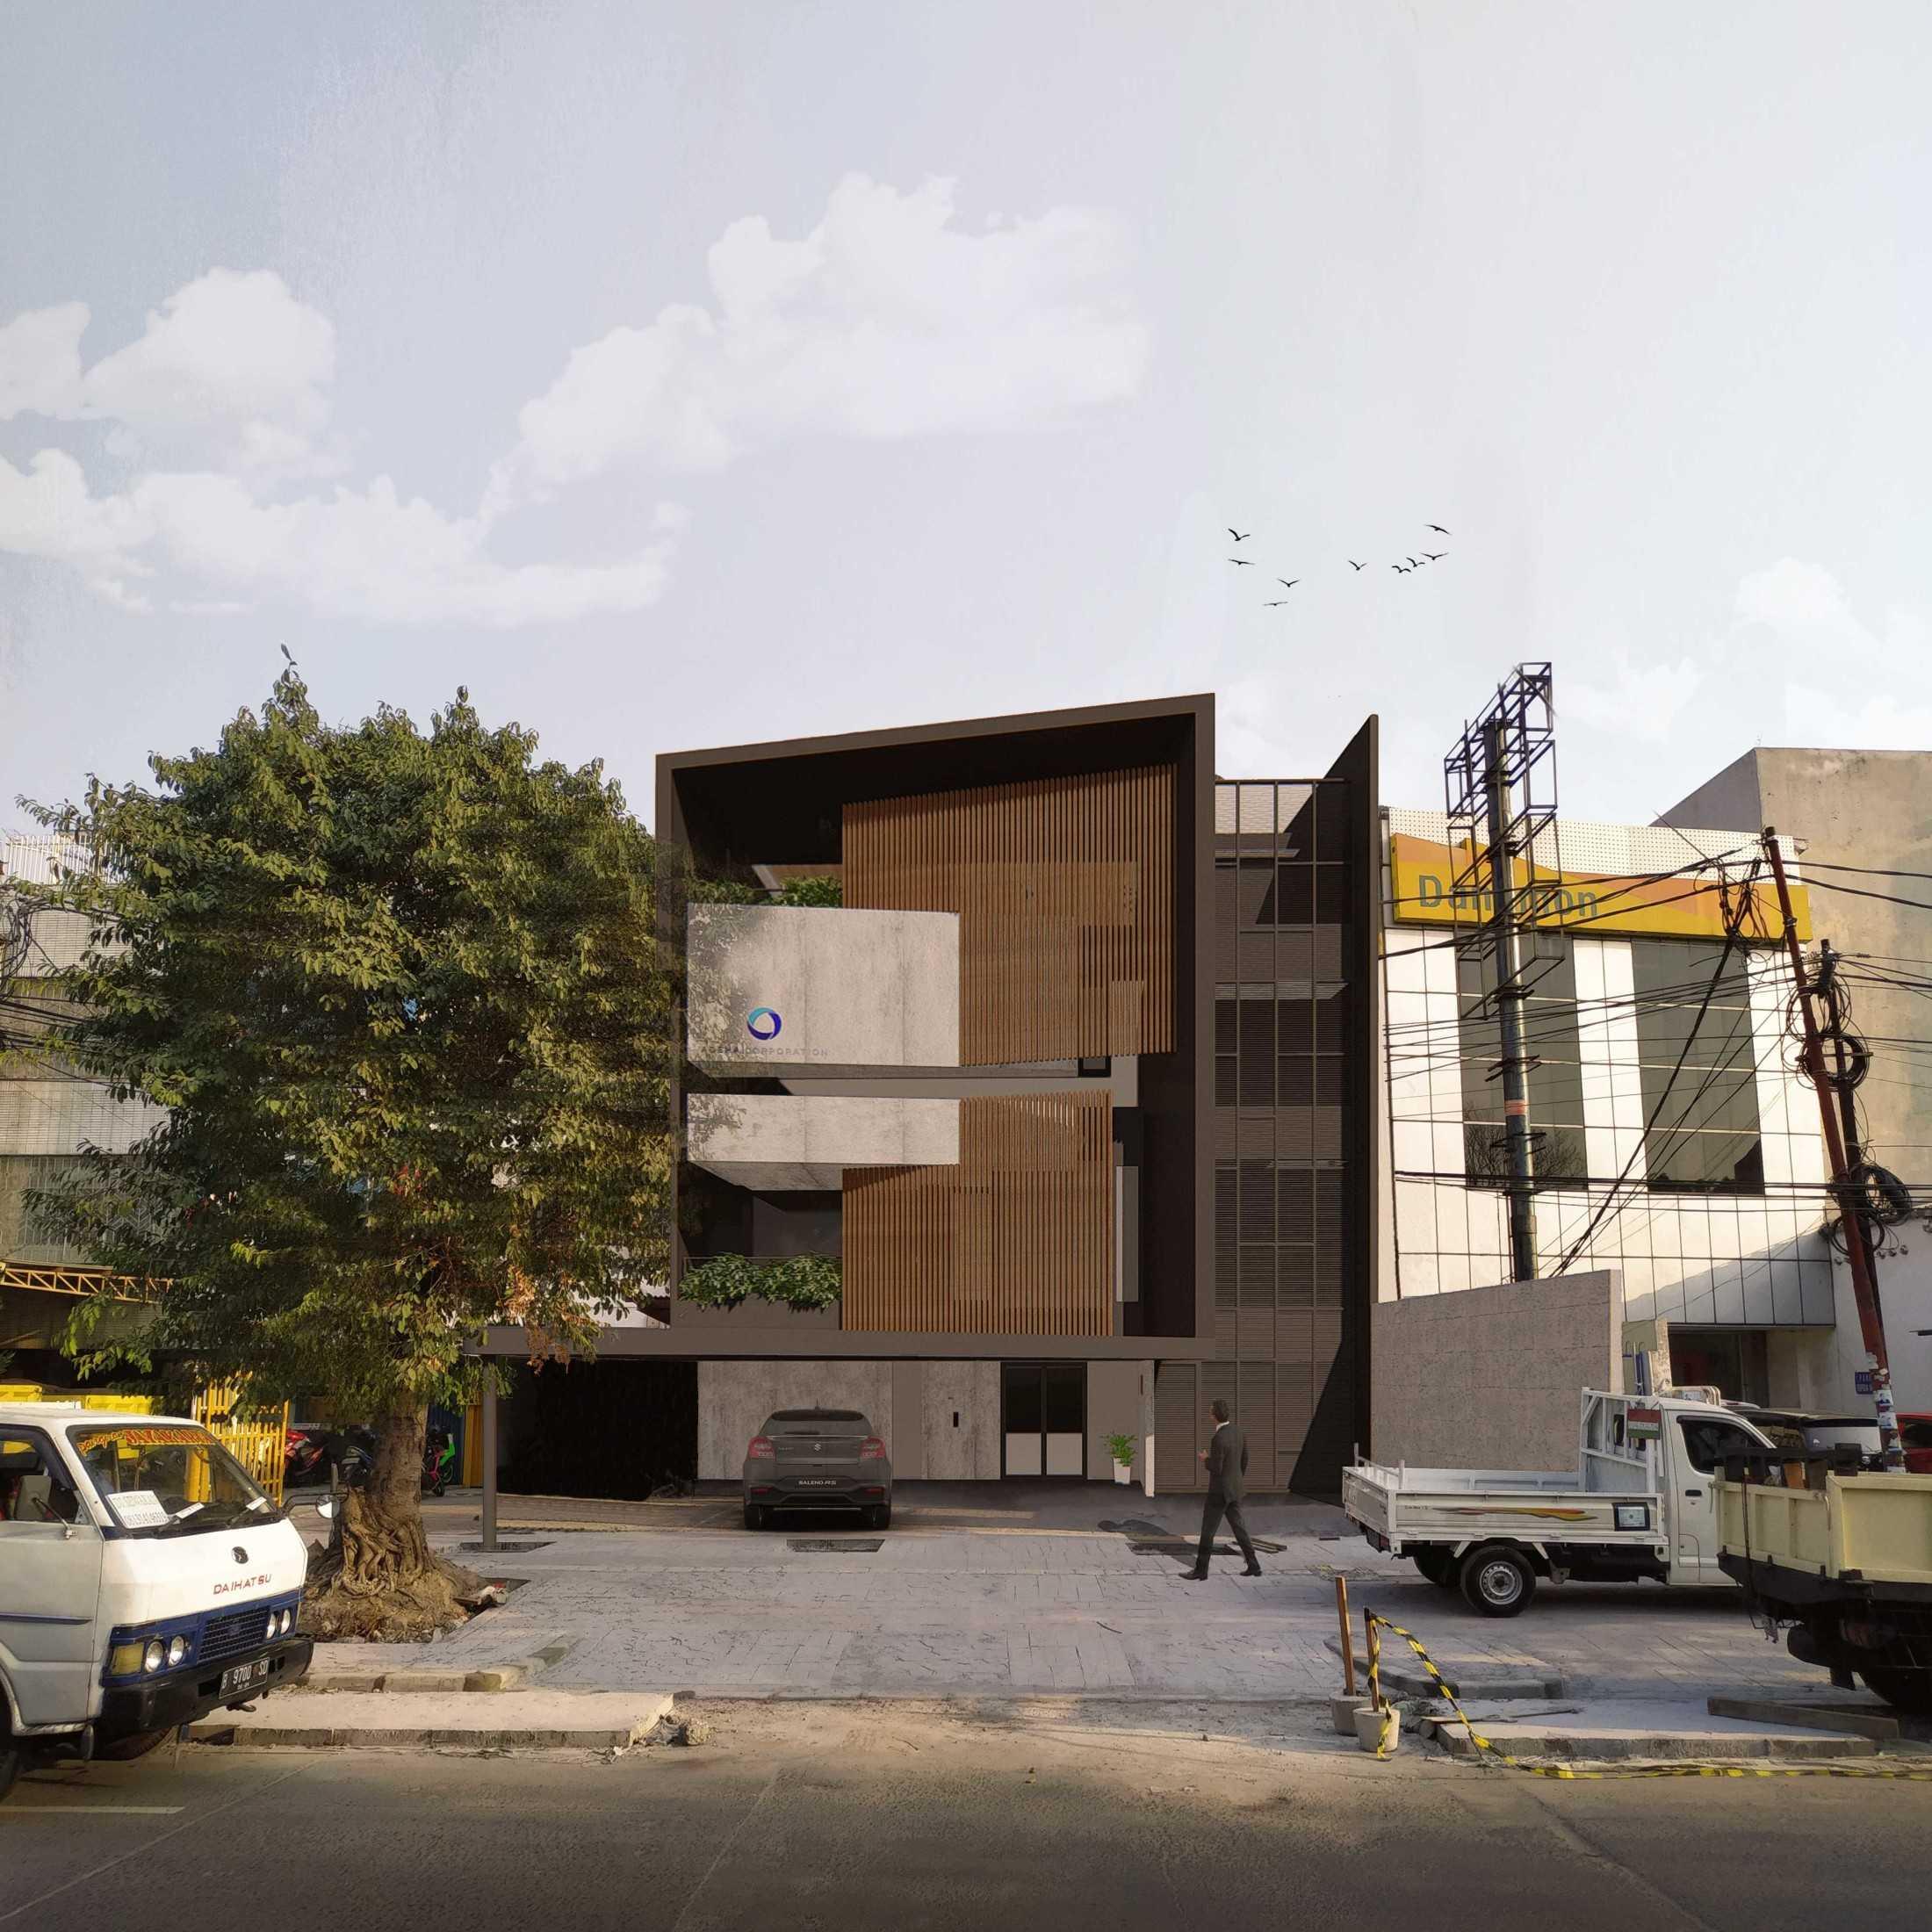 Pt. Modula Adeha Office Jakarta, Daerah Khusus Ibukota Jakarta, Indonesia Jakarta, Daerah Khusus Ibukota Jakarta, Indonesia Pt-Modula-Adeha-Office  92089